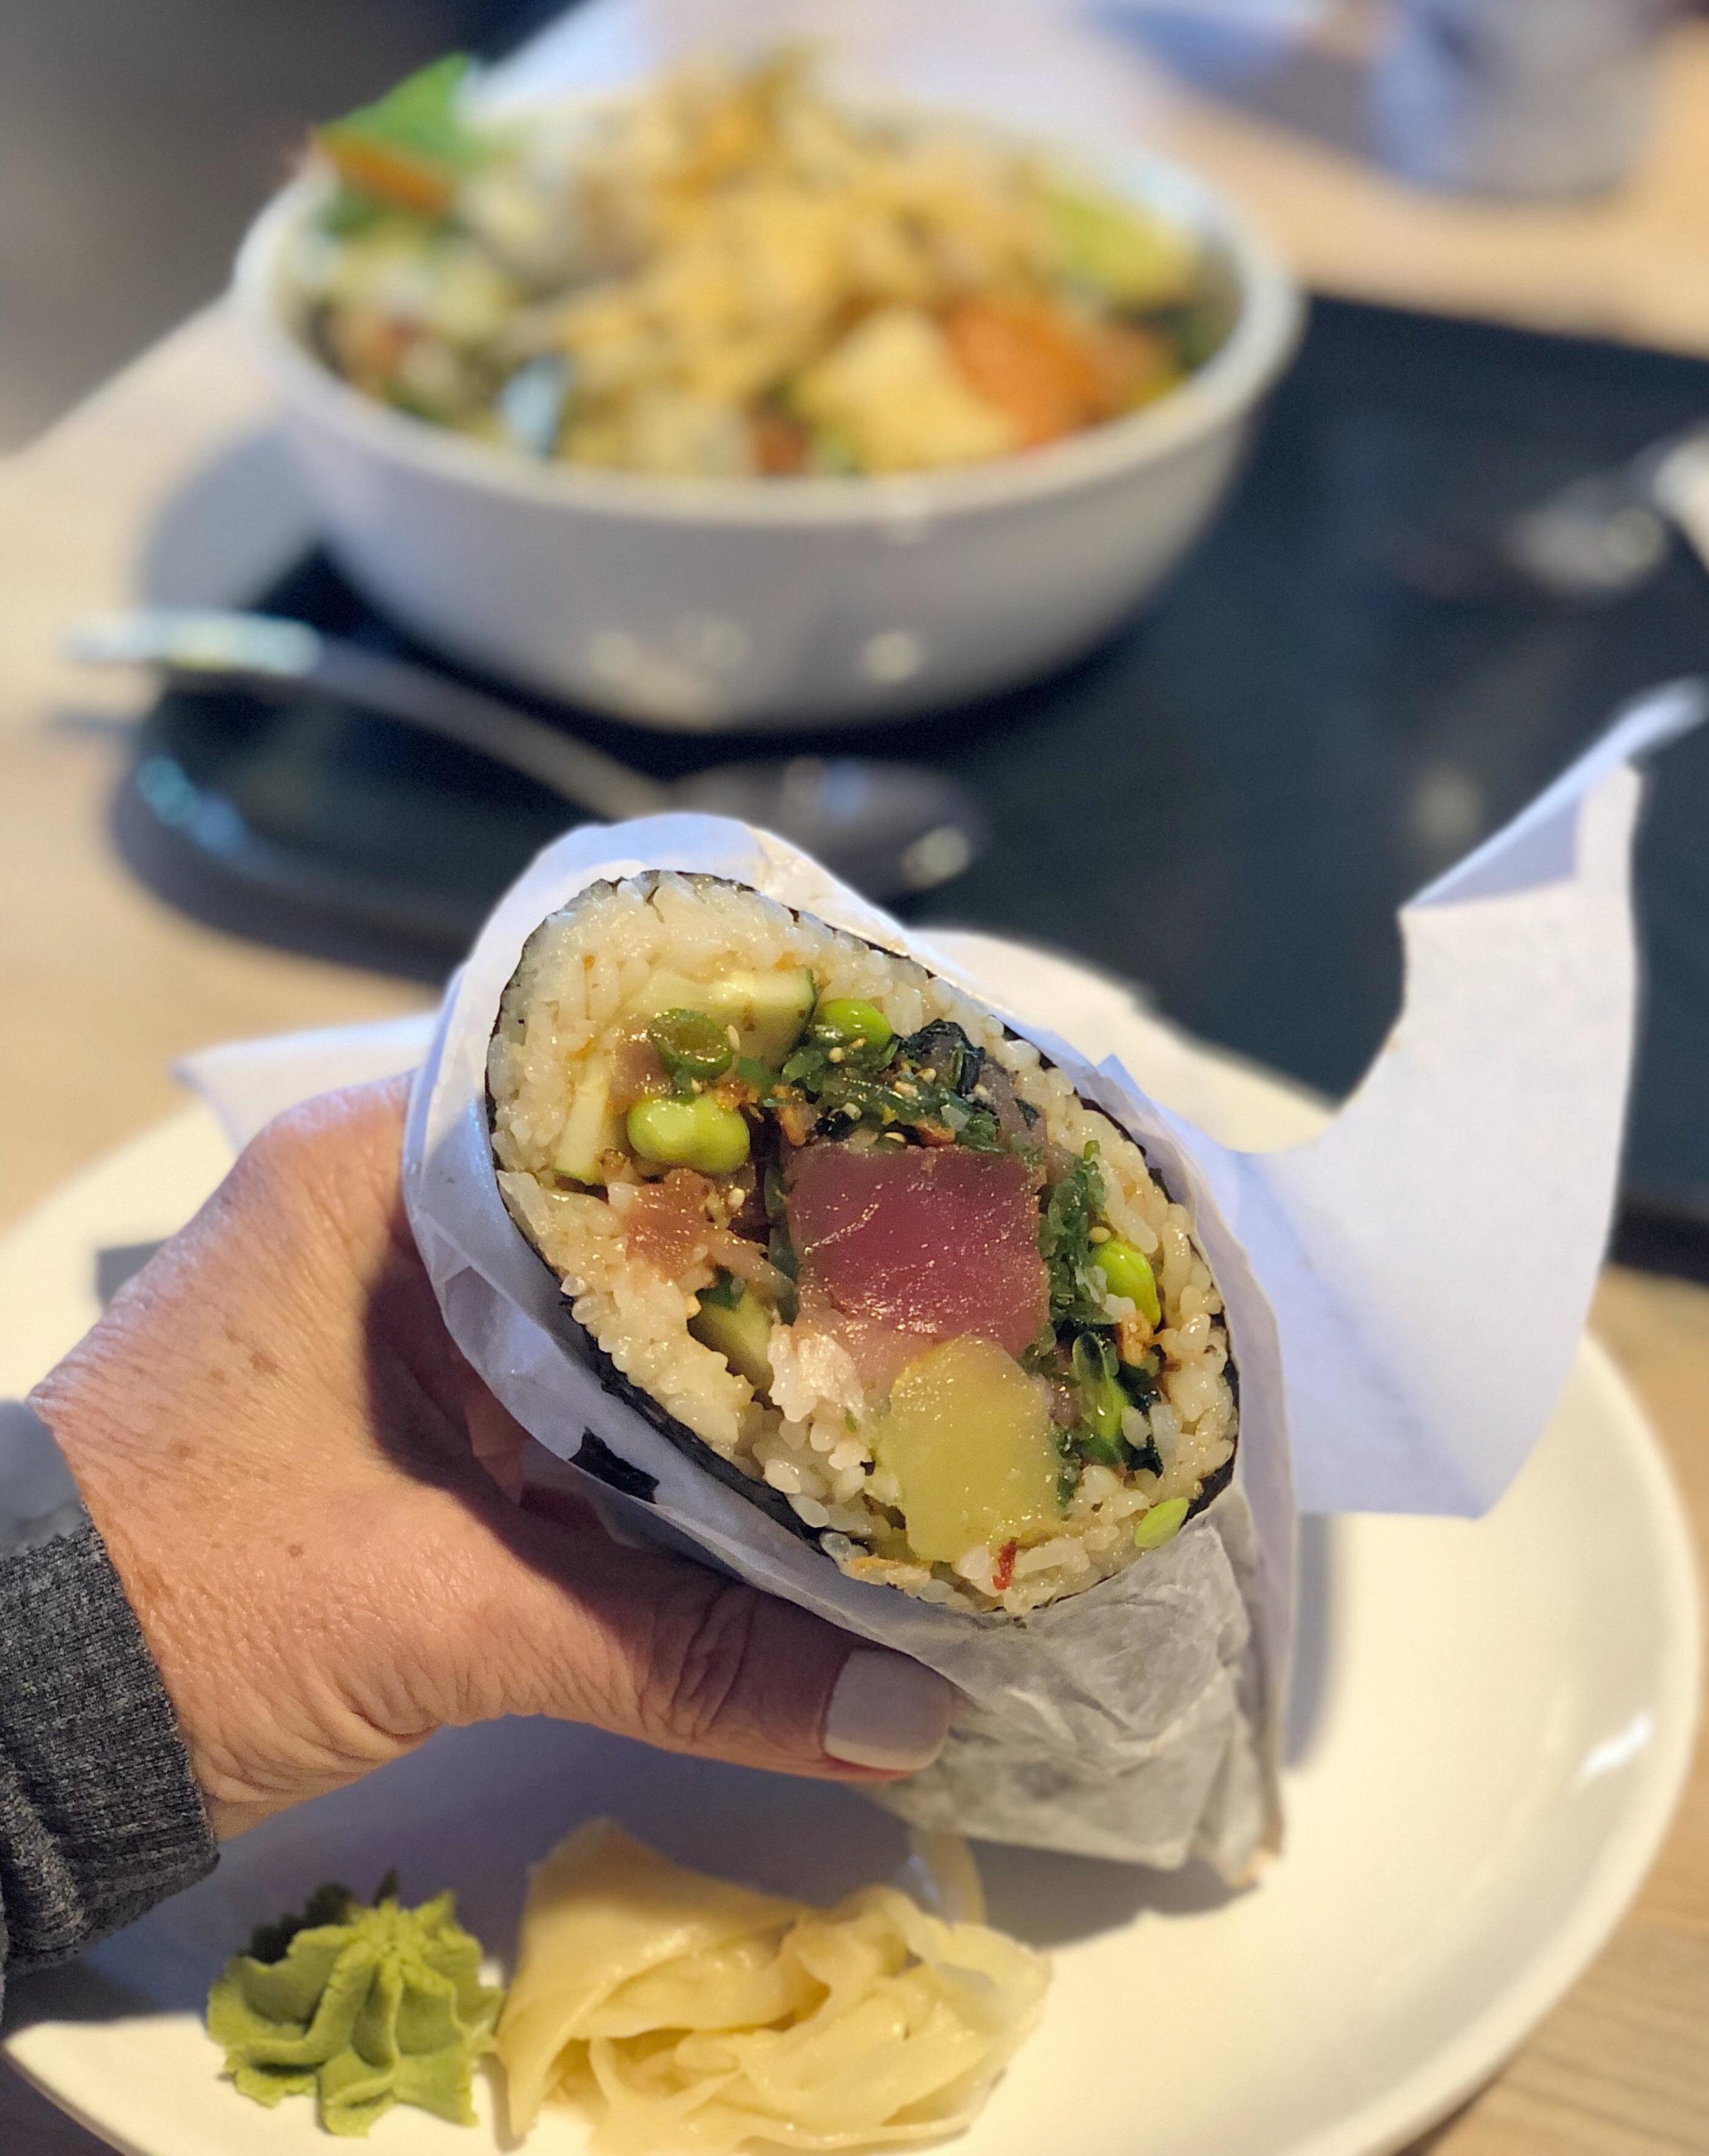 bgw - sushi bowl 2.jpg